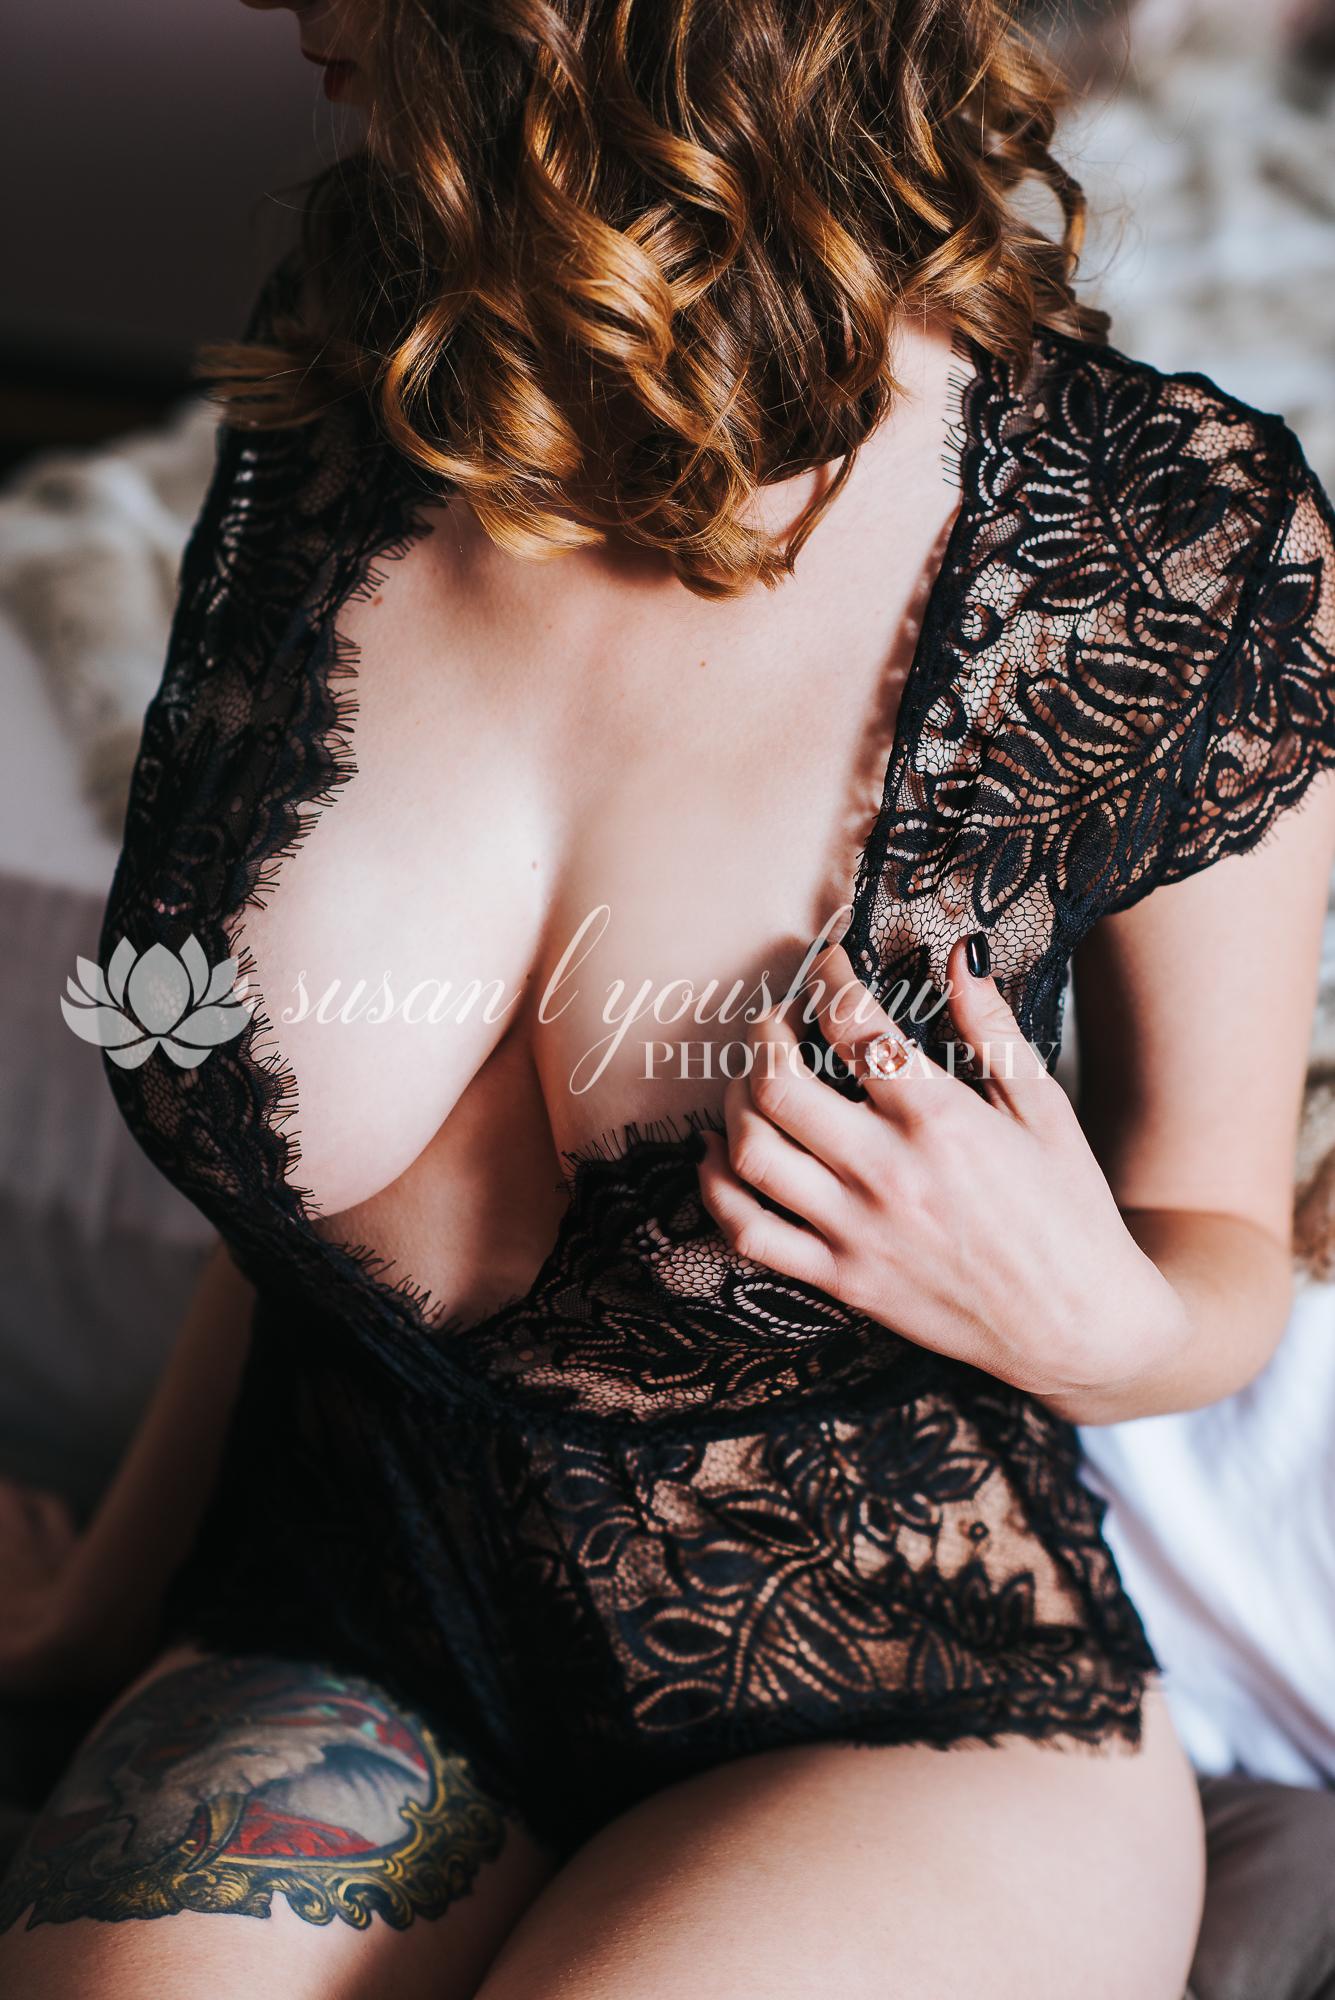 boudoir miss g 11-20-2018 SLY Photography LLC-9.jpg